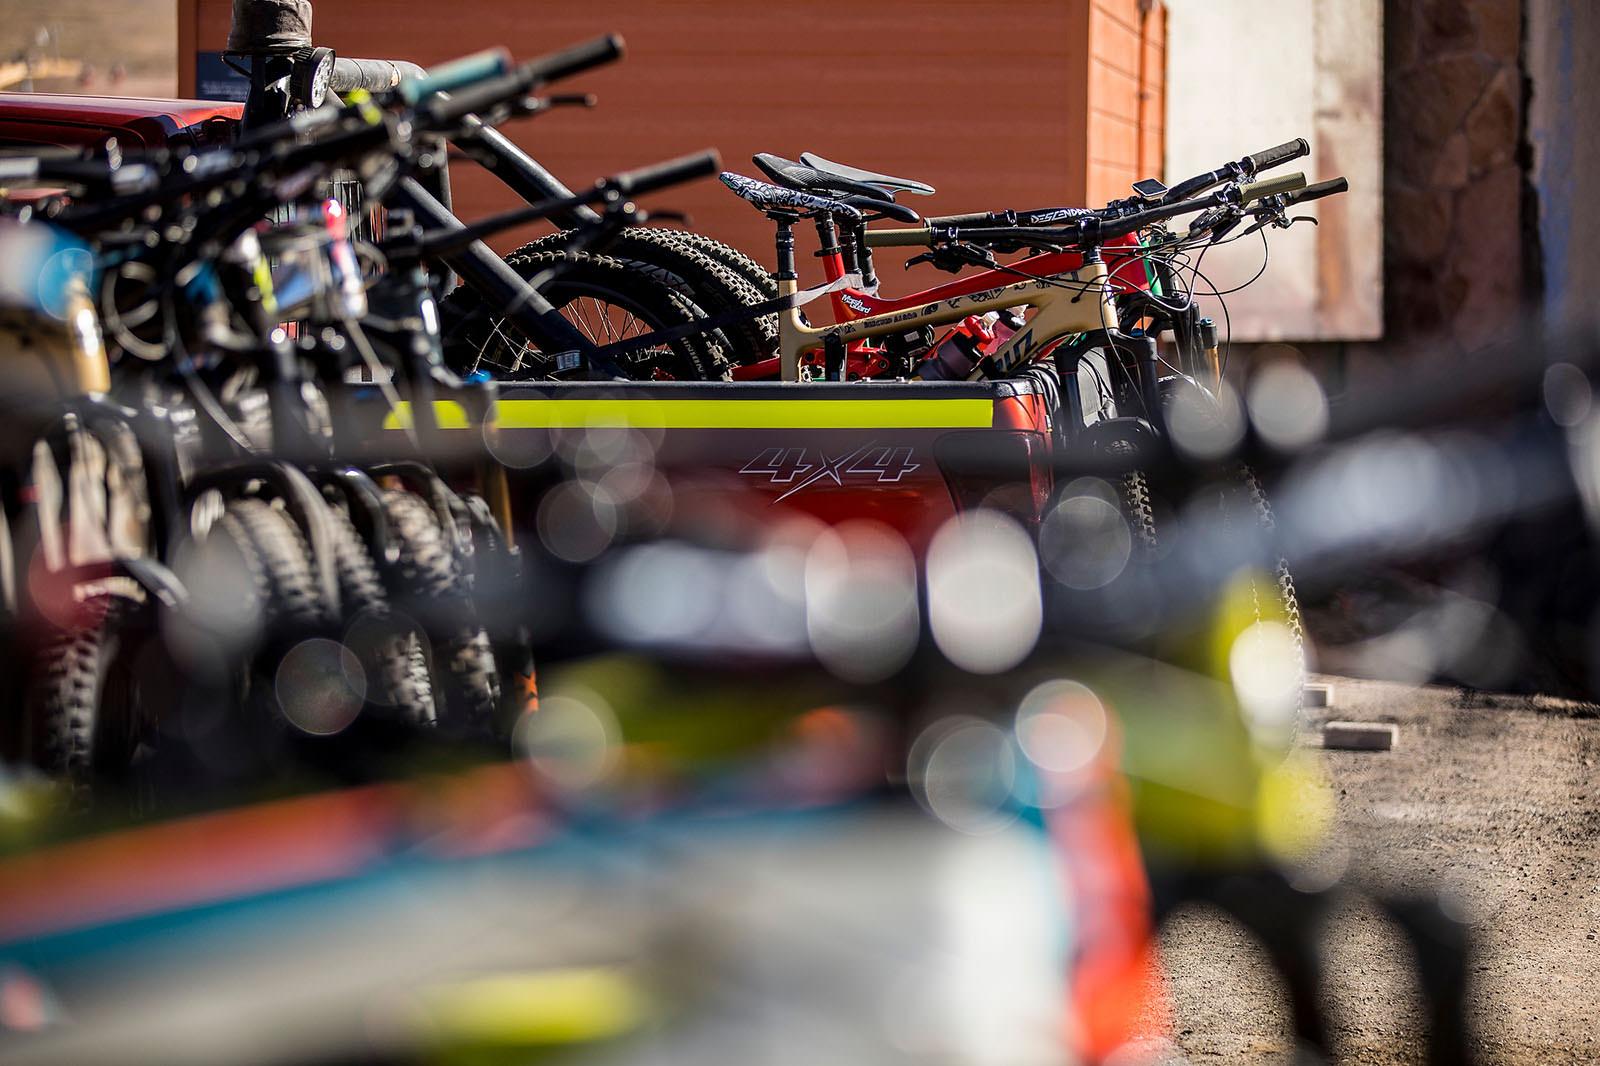 Santa Cruz Bicycles - Stacking Bikes for EWS Round One in Chile